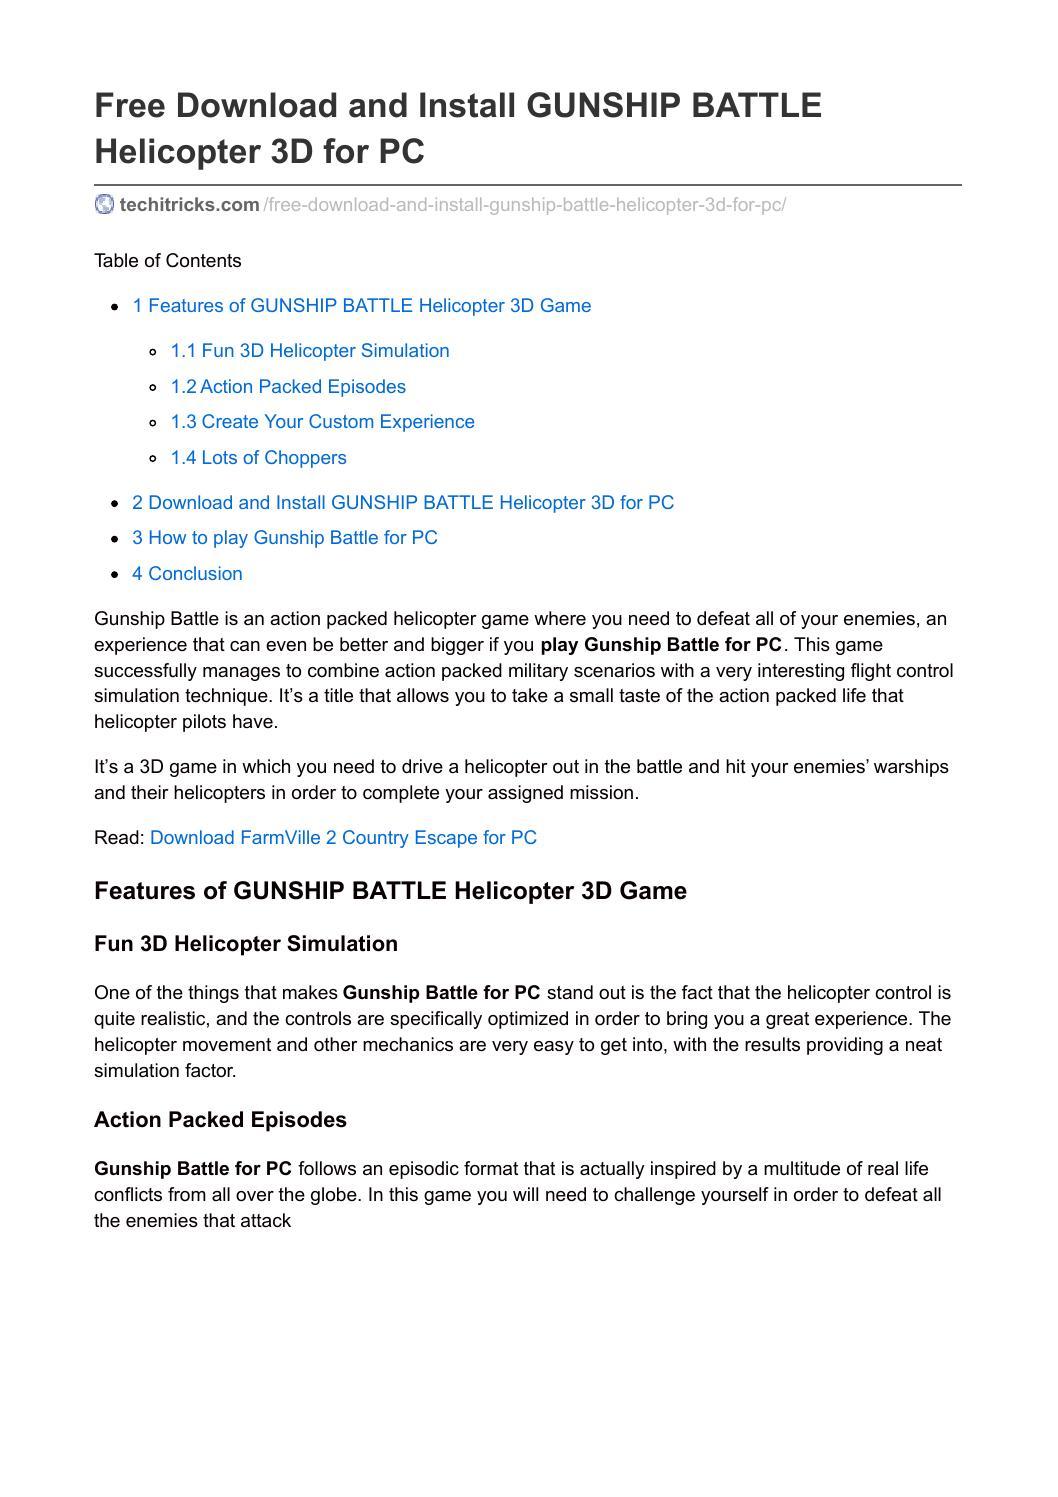 Free download and install gunship battle helicopter 3d for pc by free download and install gunship battle helicopter 3d for pc by techitricks issuu solutioingenieria Gallery